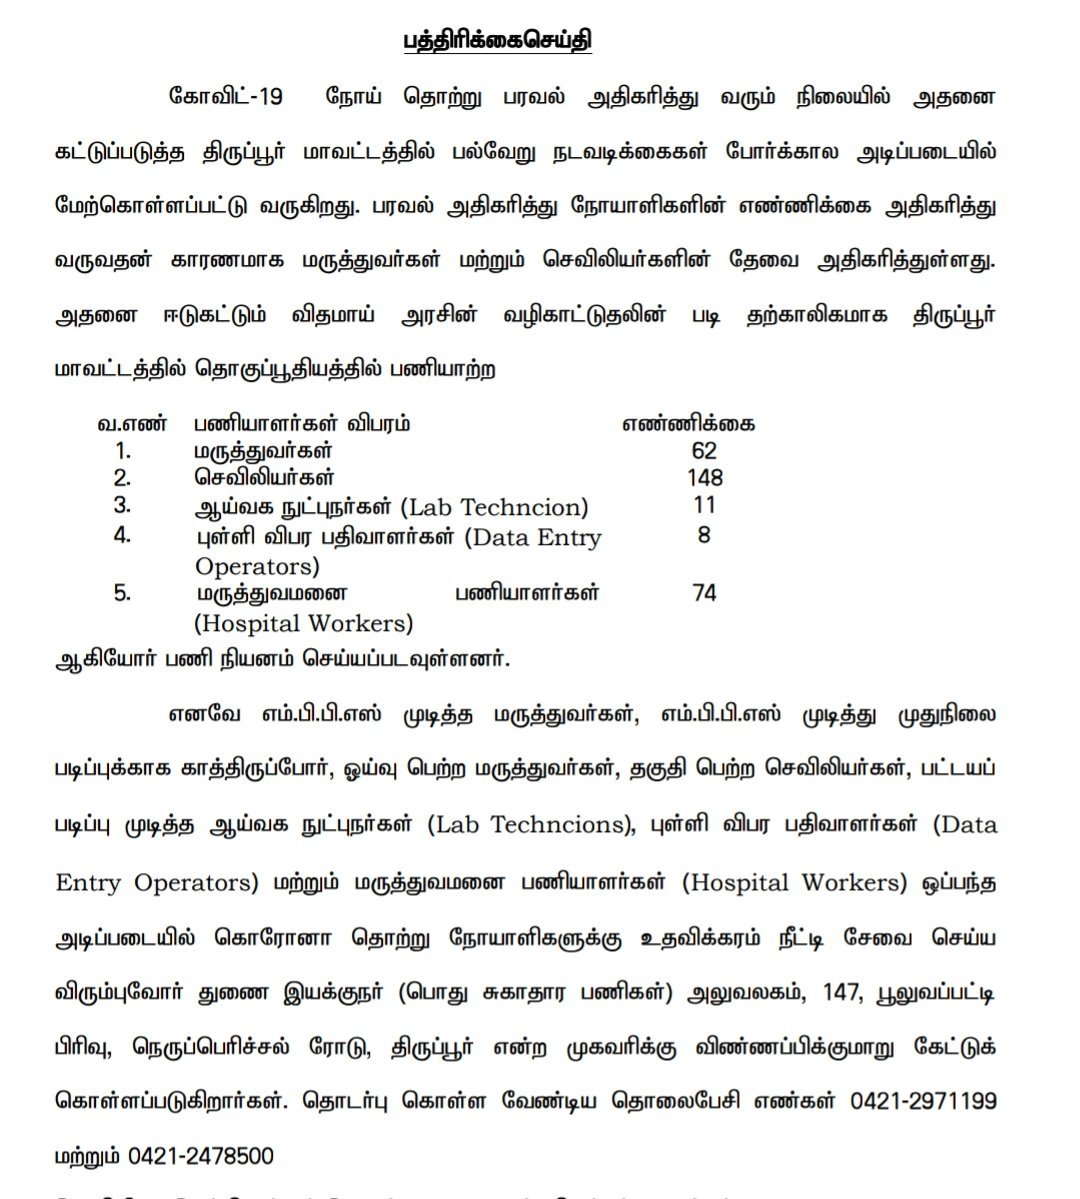 Doctors and other Related field Recruitment in Thirupur 2021   திருப்பூரில் மருத்துவர்கள் மற்றும் துறை சார்ந்த பணியாளர்கள் ஆட்சேர்ப்பு 2021  _50.1